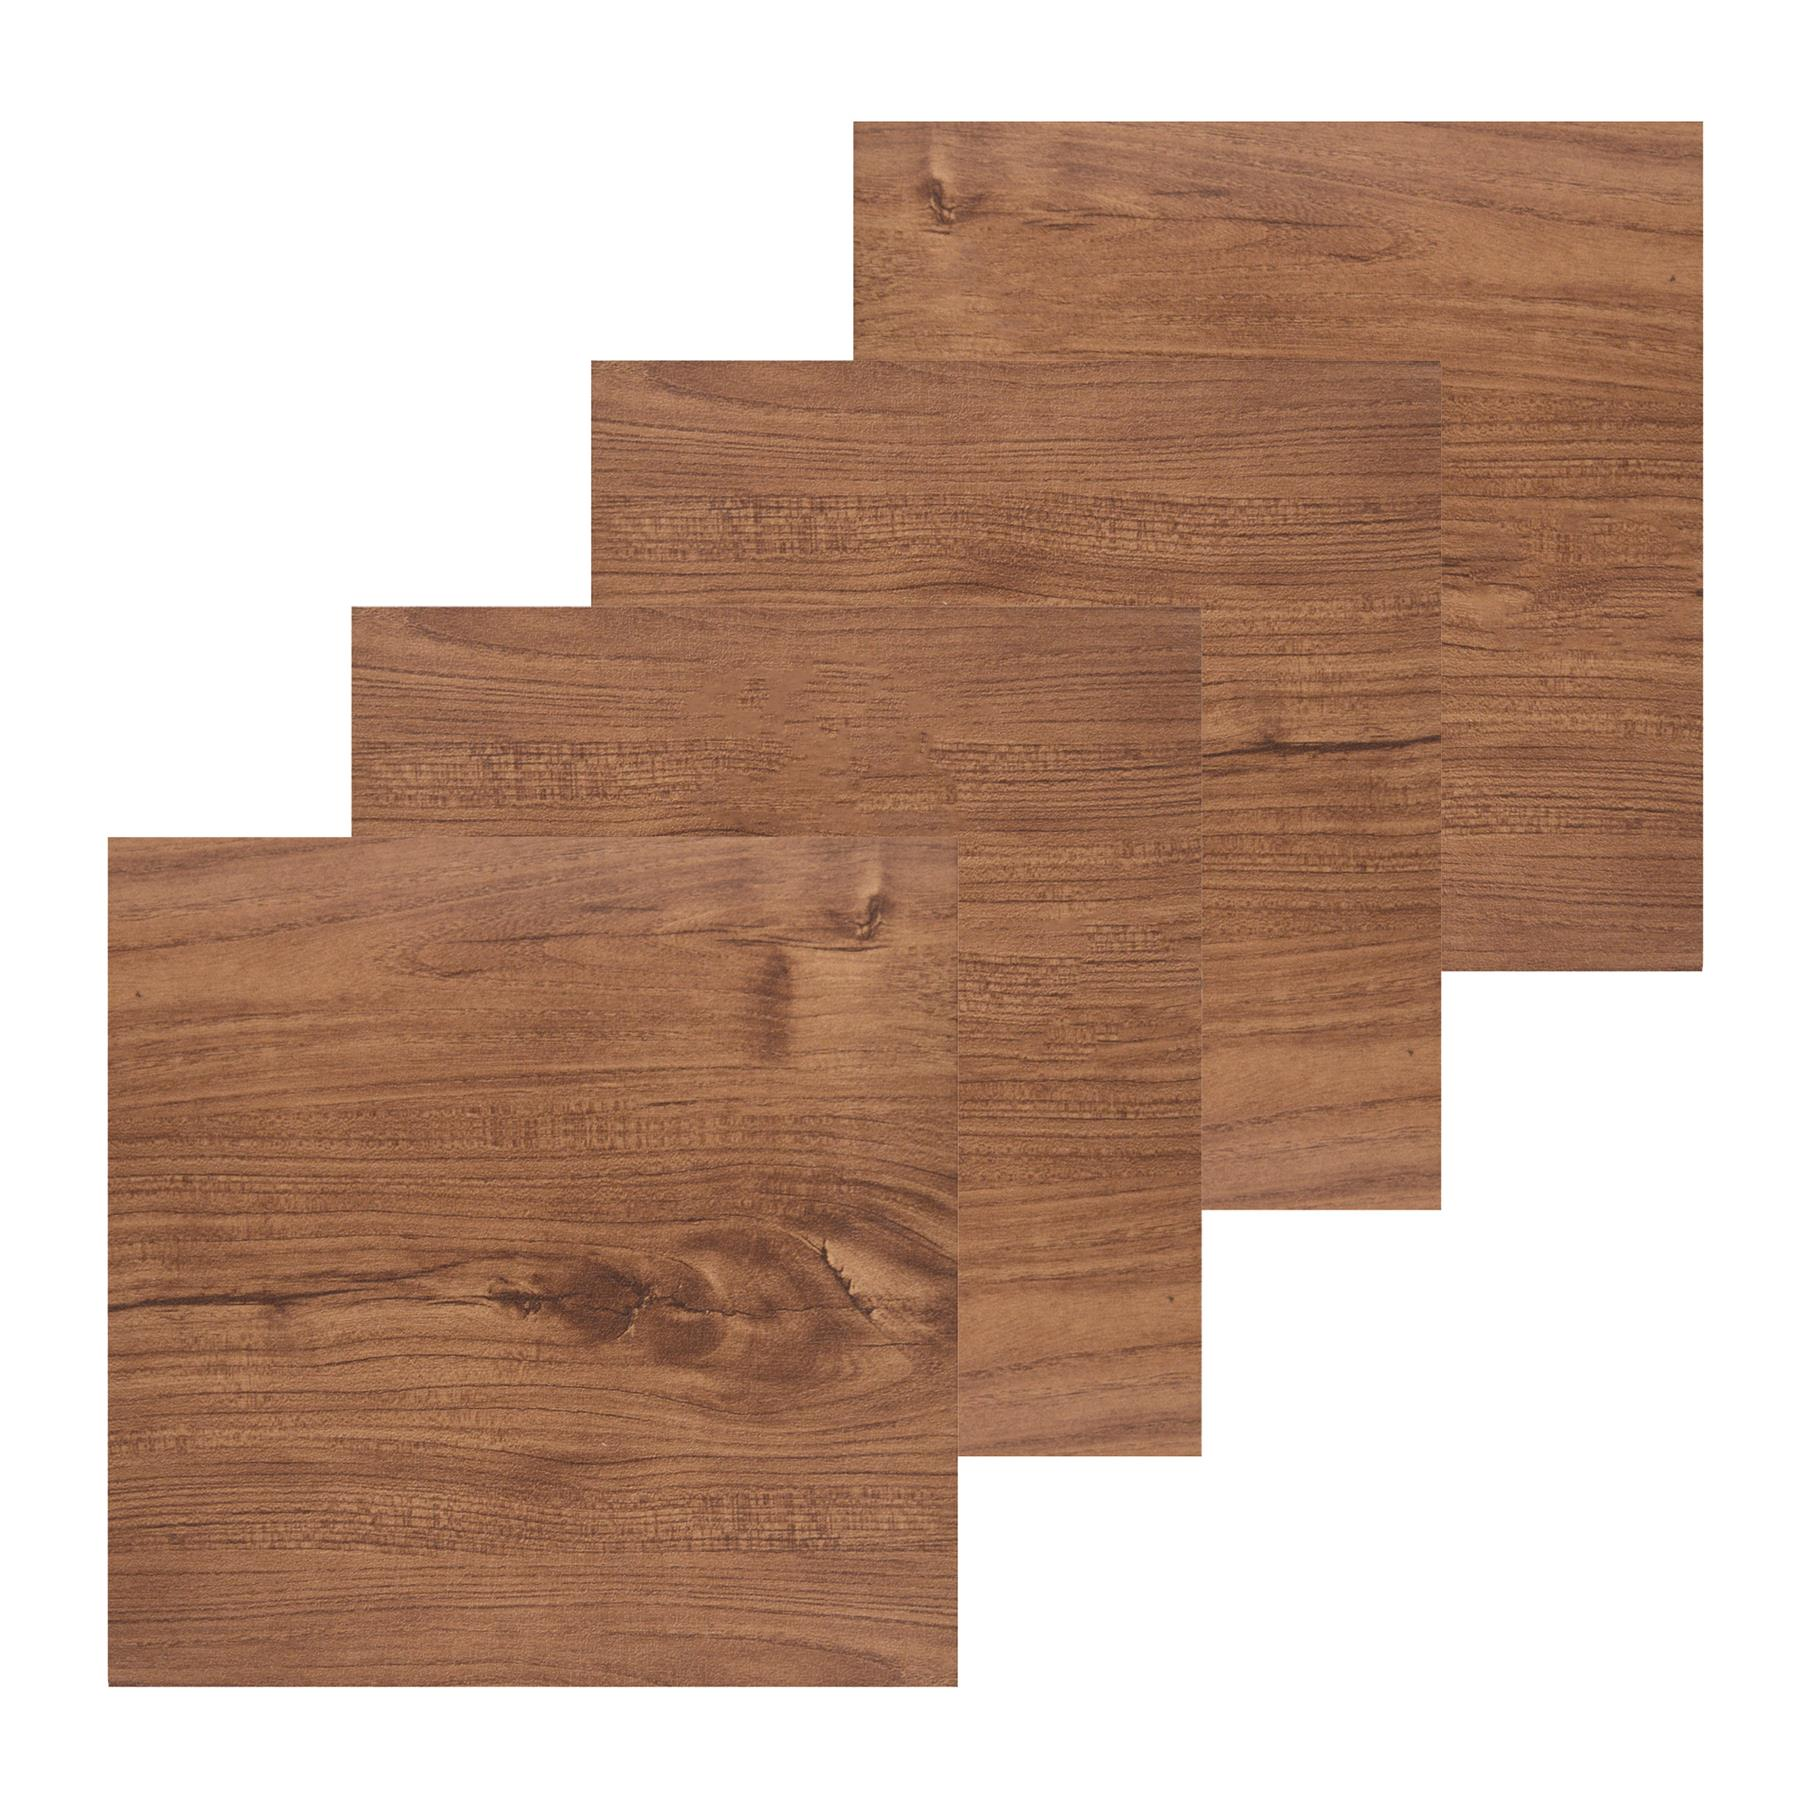 Floor-Tiles-Self-Adhesive-Vinyl-Flooring-Kitchen-Bathroom-Brown-Wood-Grain thumbnail 14